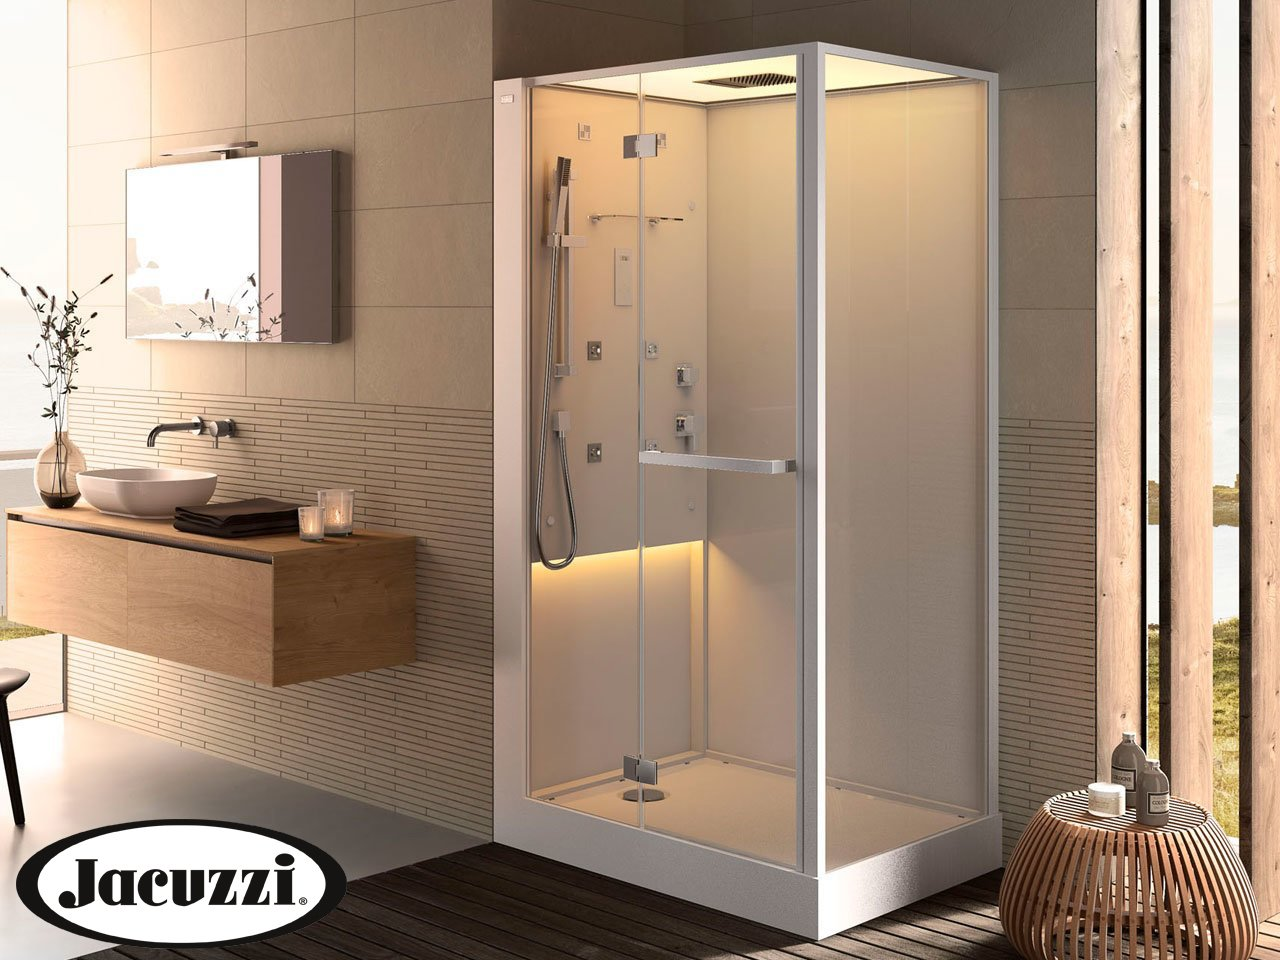 Projecta by jacuzzi bali cabina idro led cm 120x80 - Ikea catalogo box doccia ...